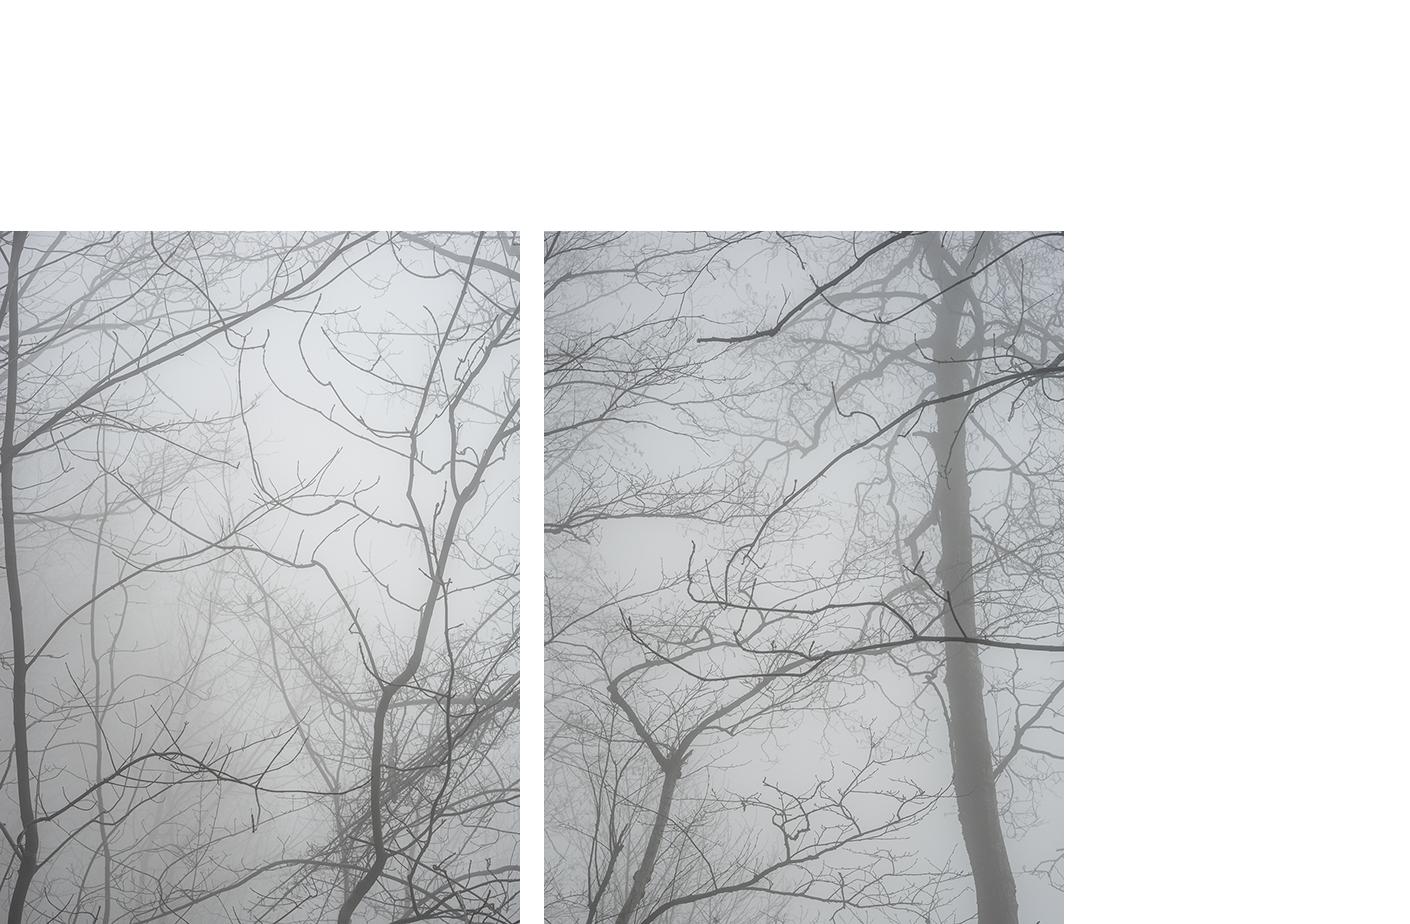 4699-20 Random Pairings #20 4699-19 Random Pairings #19  Pigment Print 5.25 x 7.00 inch Image Size 8.50 x 11.00 inch Paper Size 2 EDP / 4AP